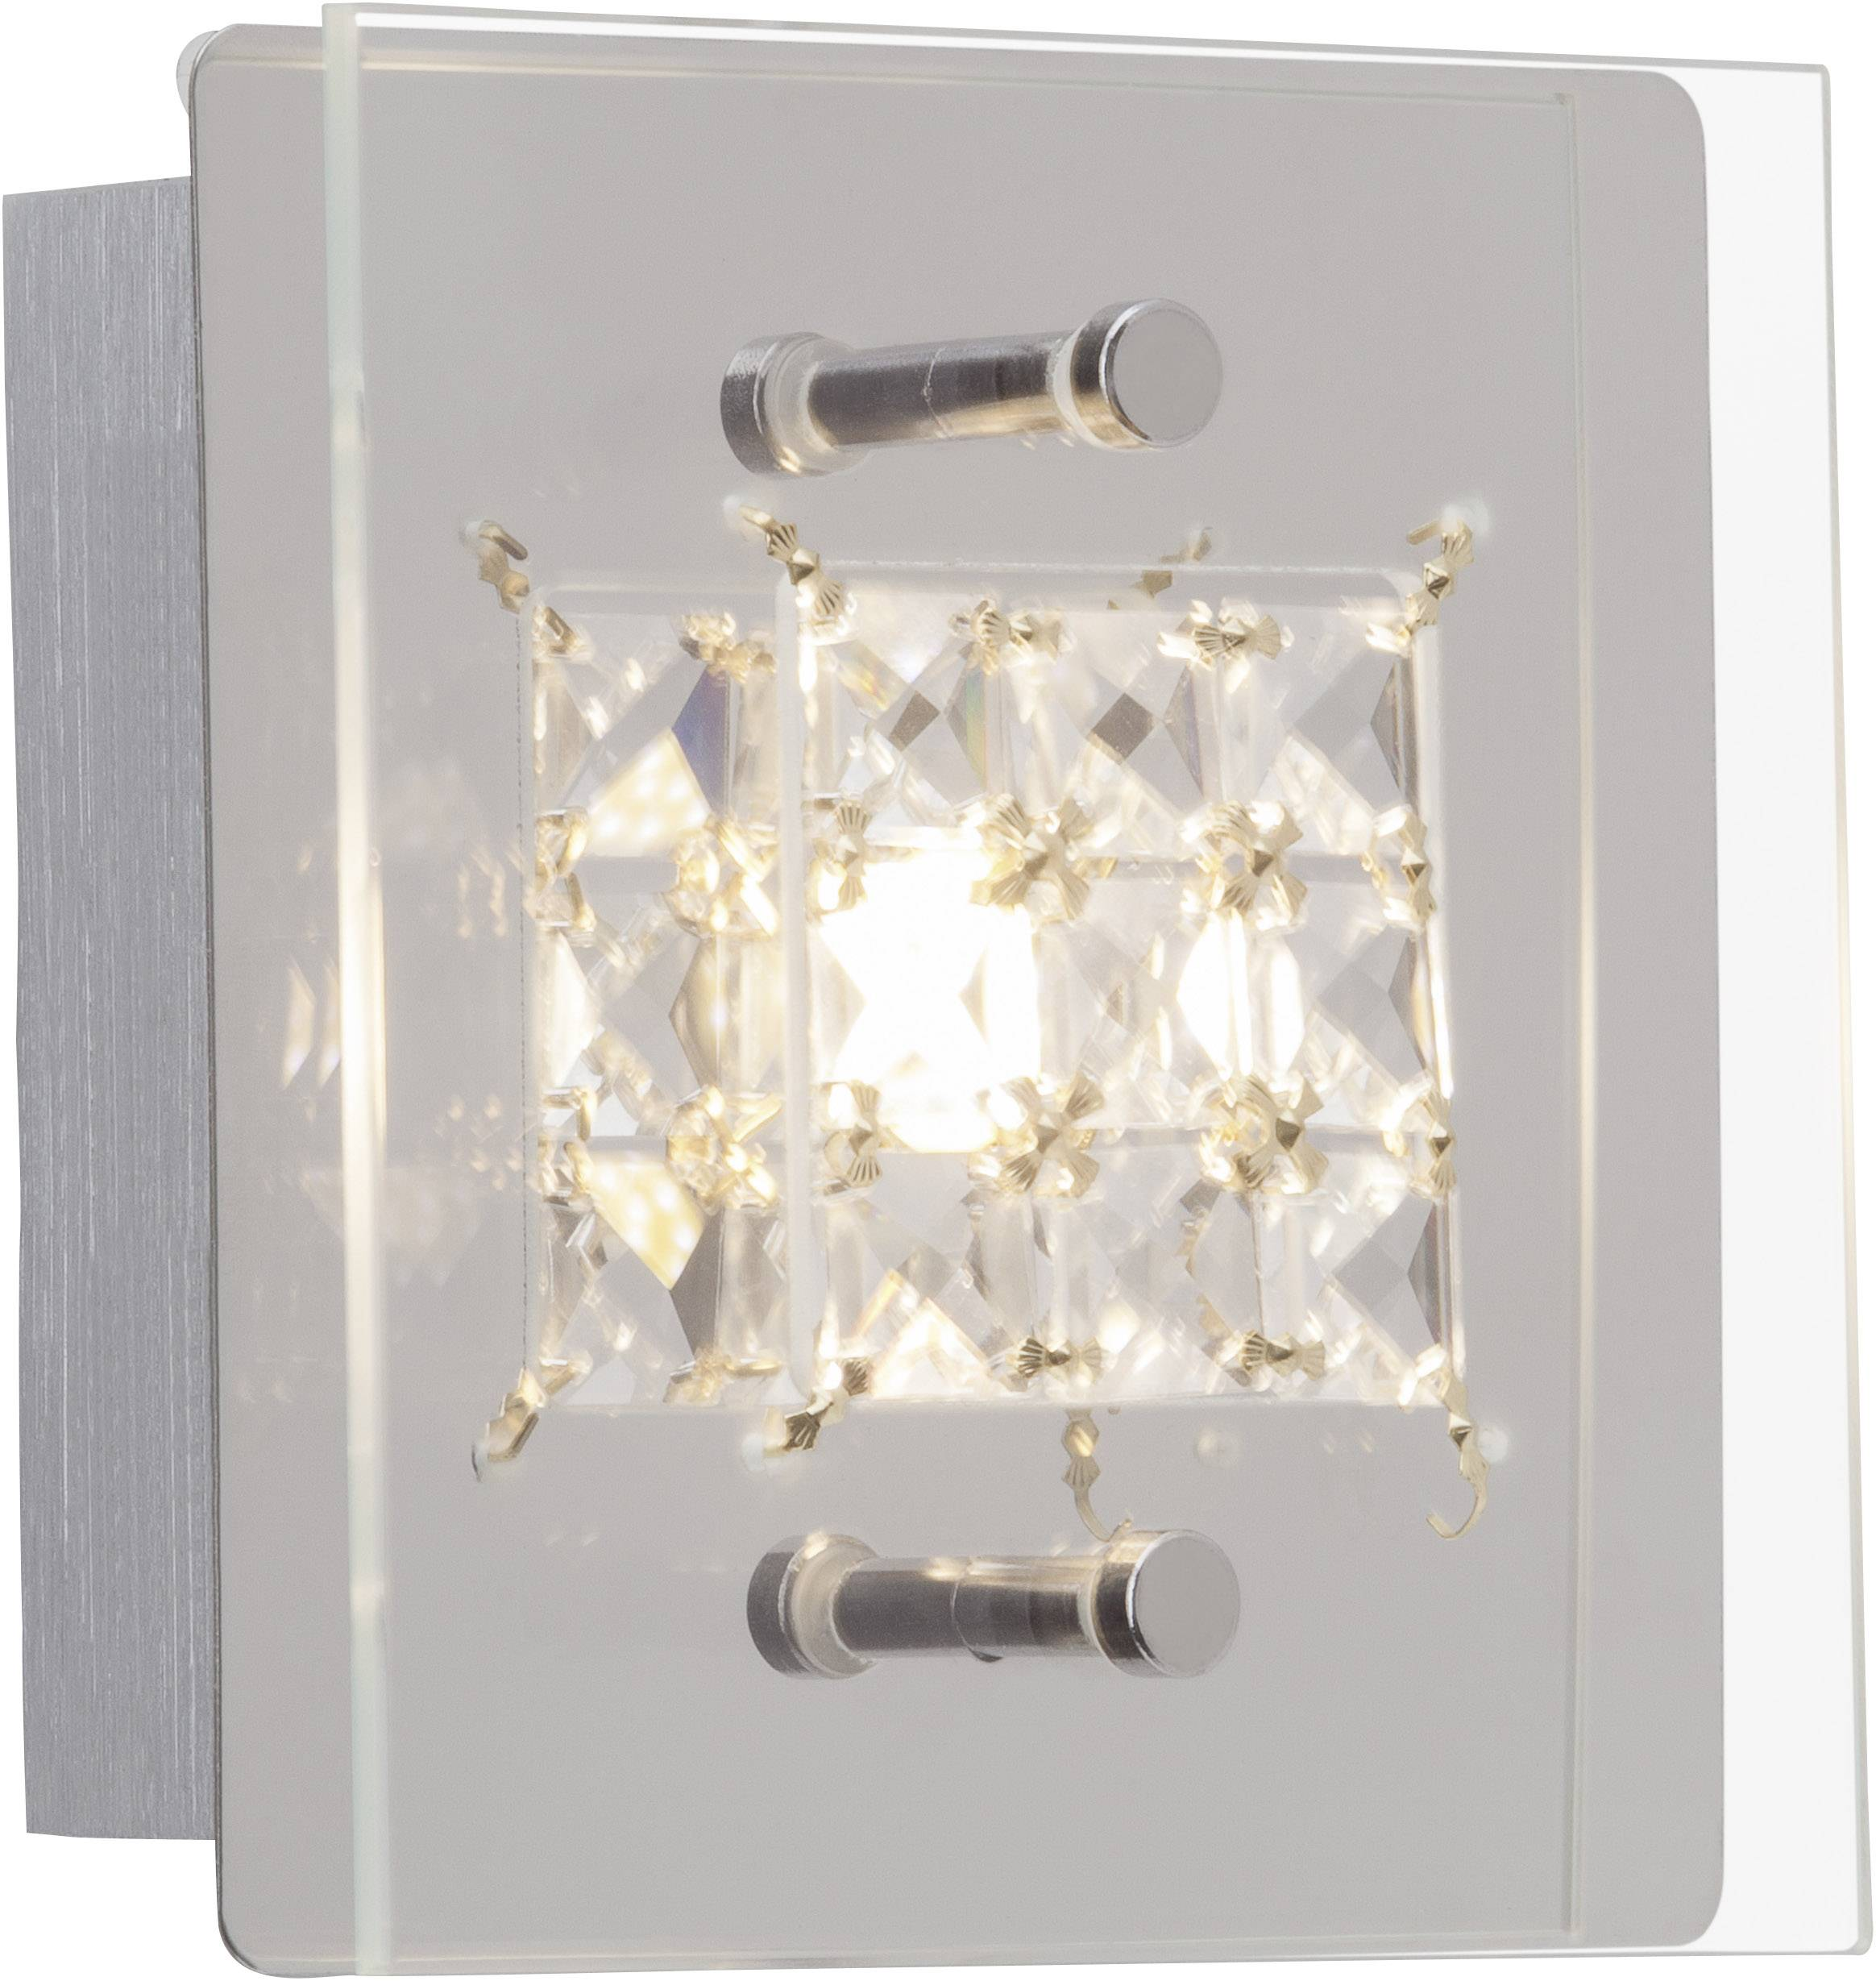 LED nástěnné světlo Brilliant Martino G94264/15, 5 W, teplá bílá, chrom